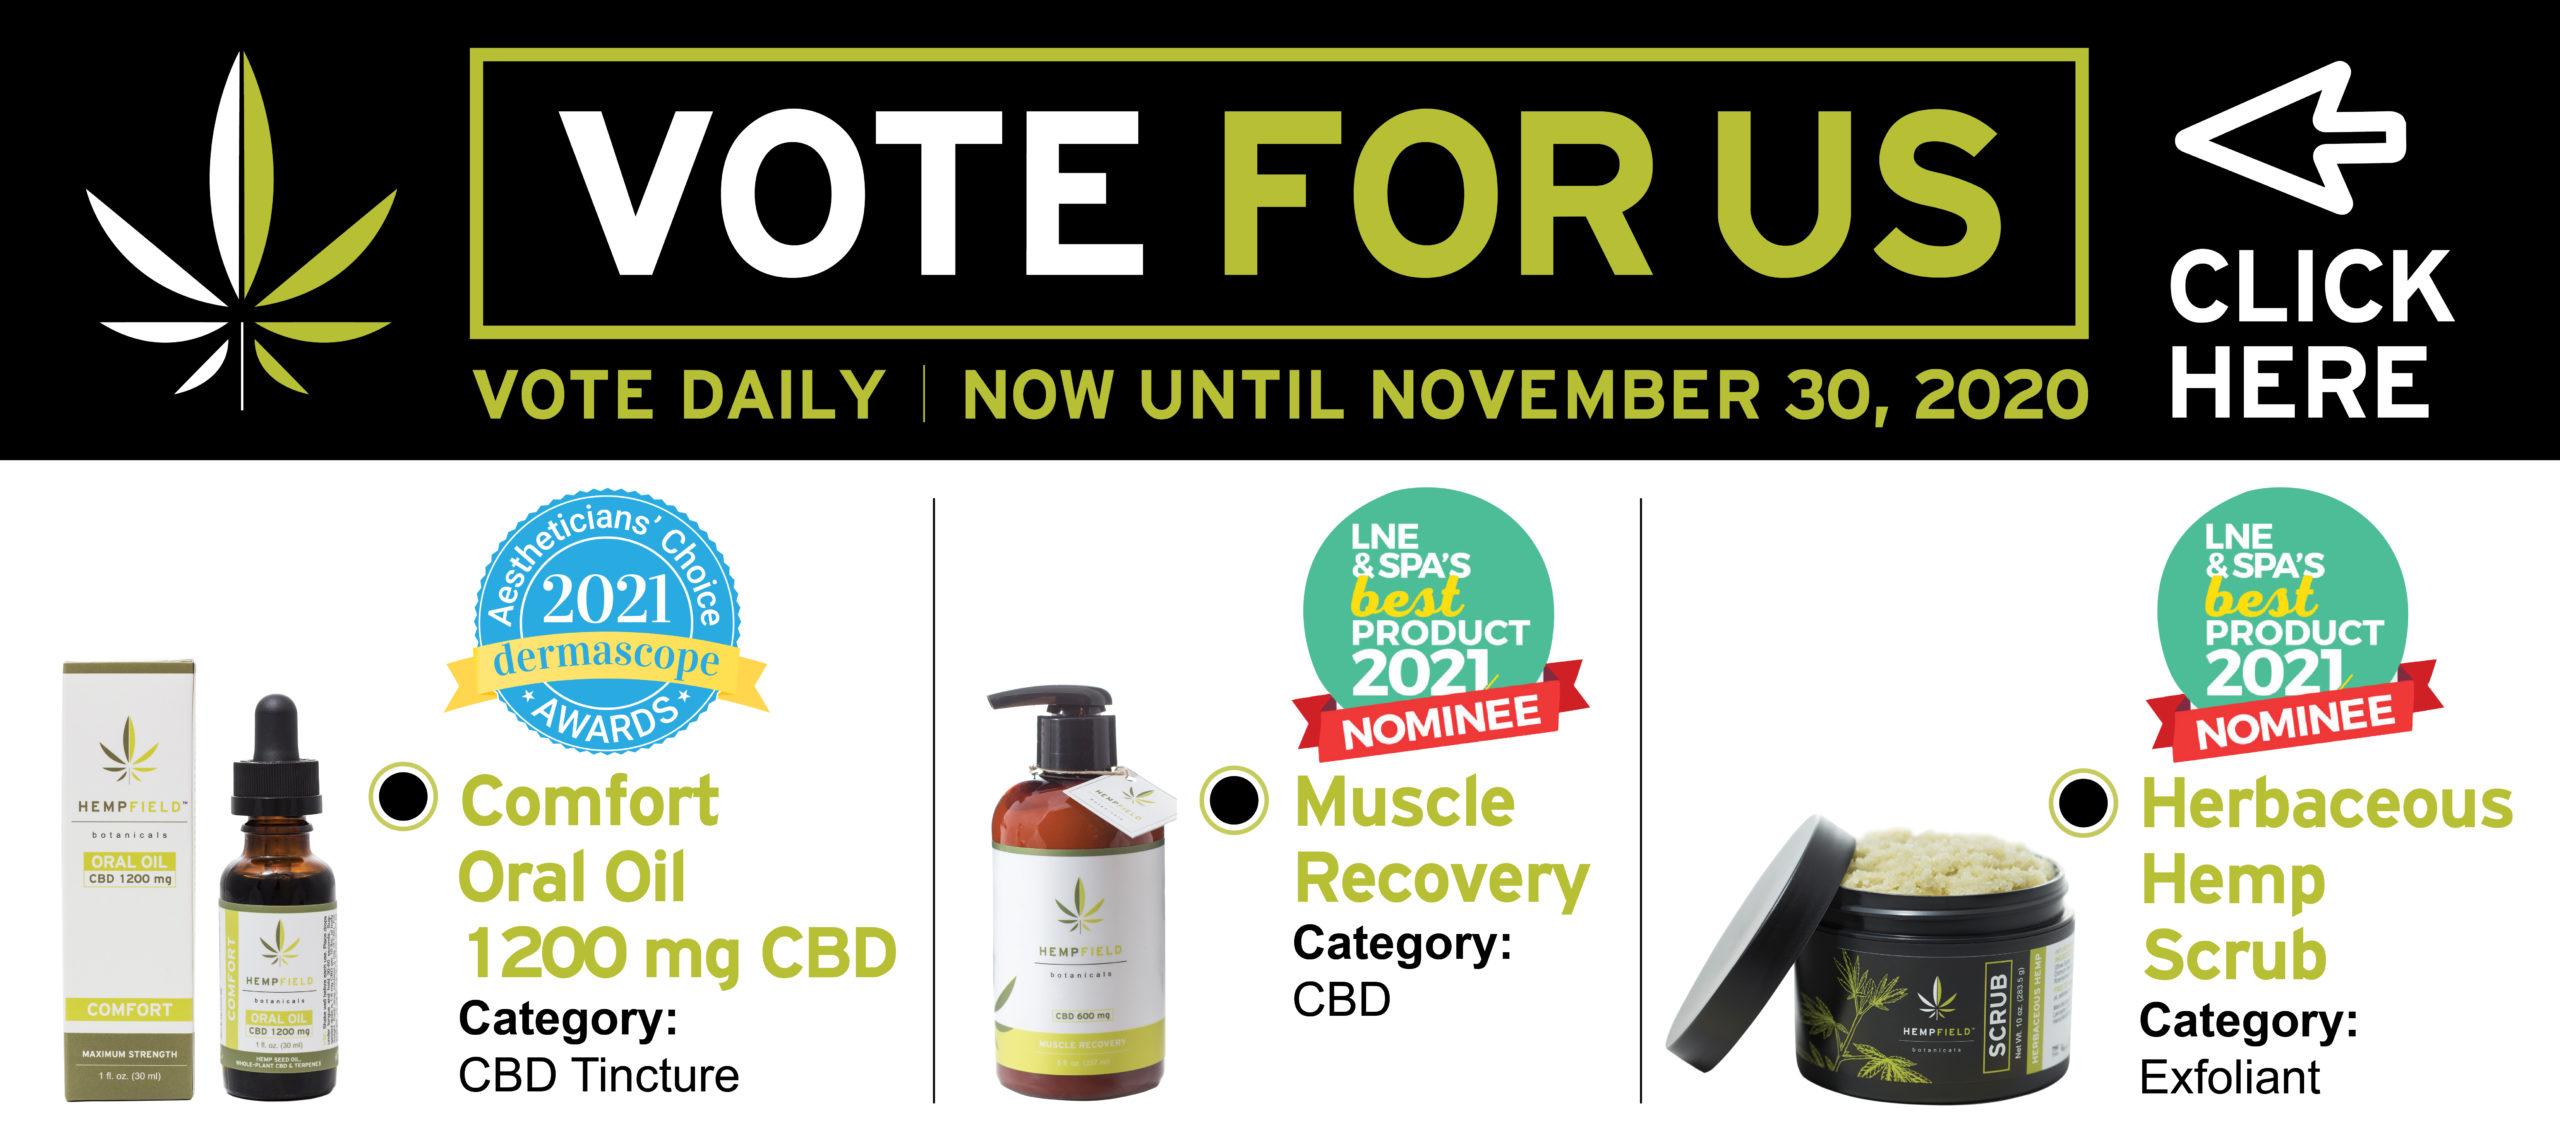 We Need your Votes | Hempfield Botanicals